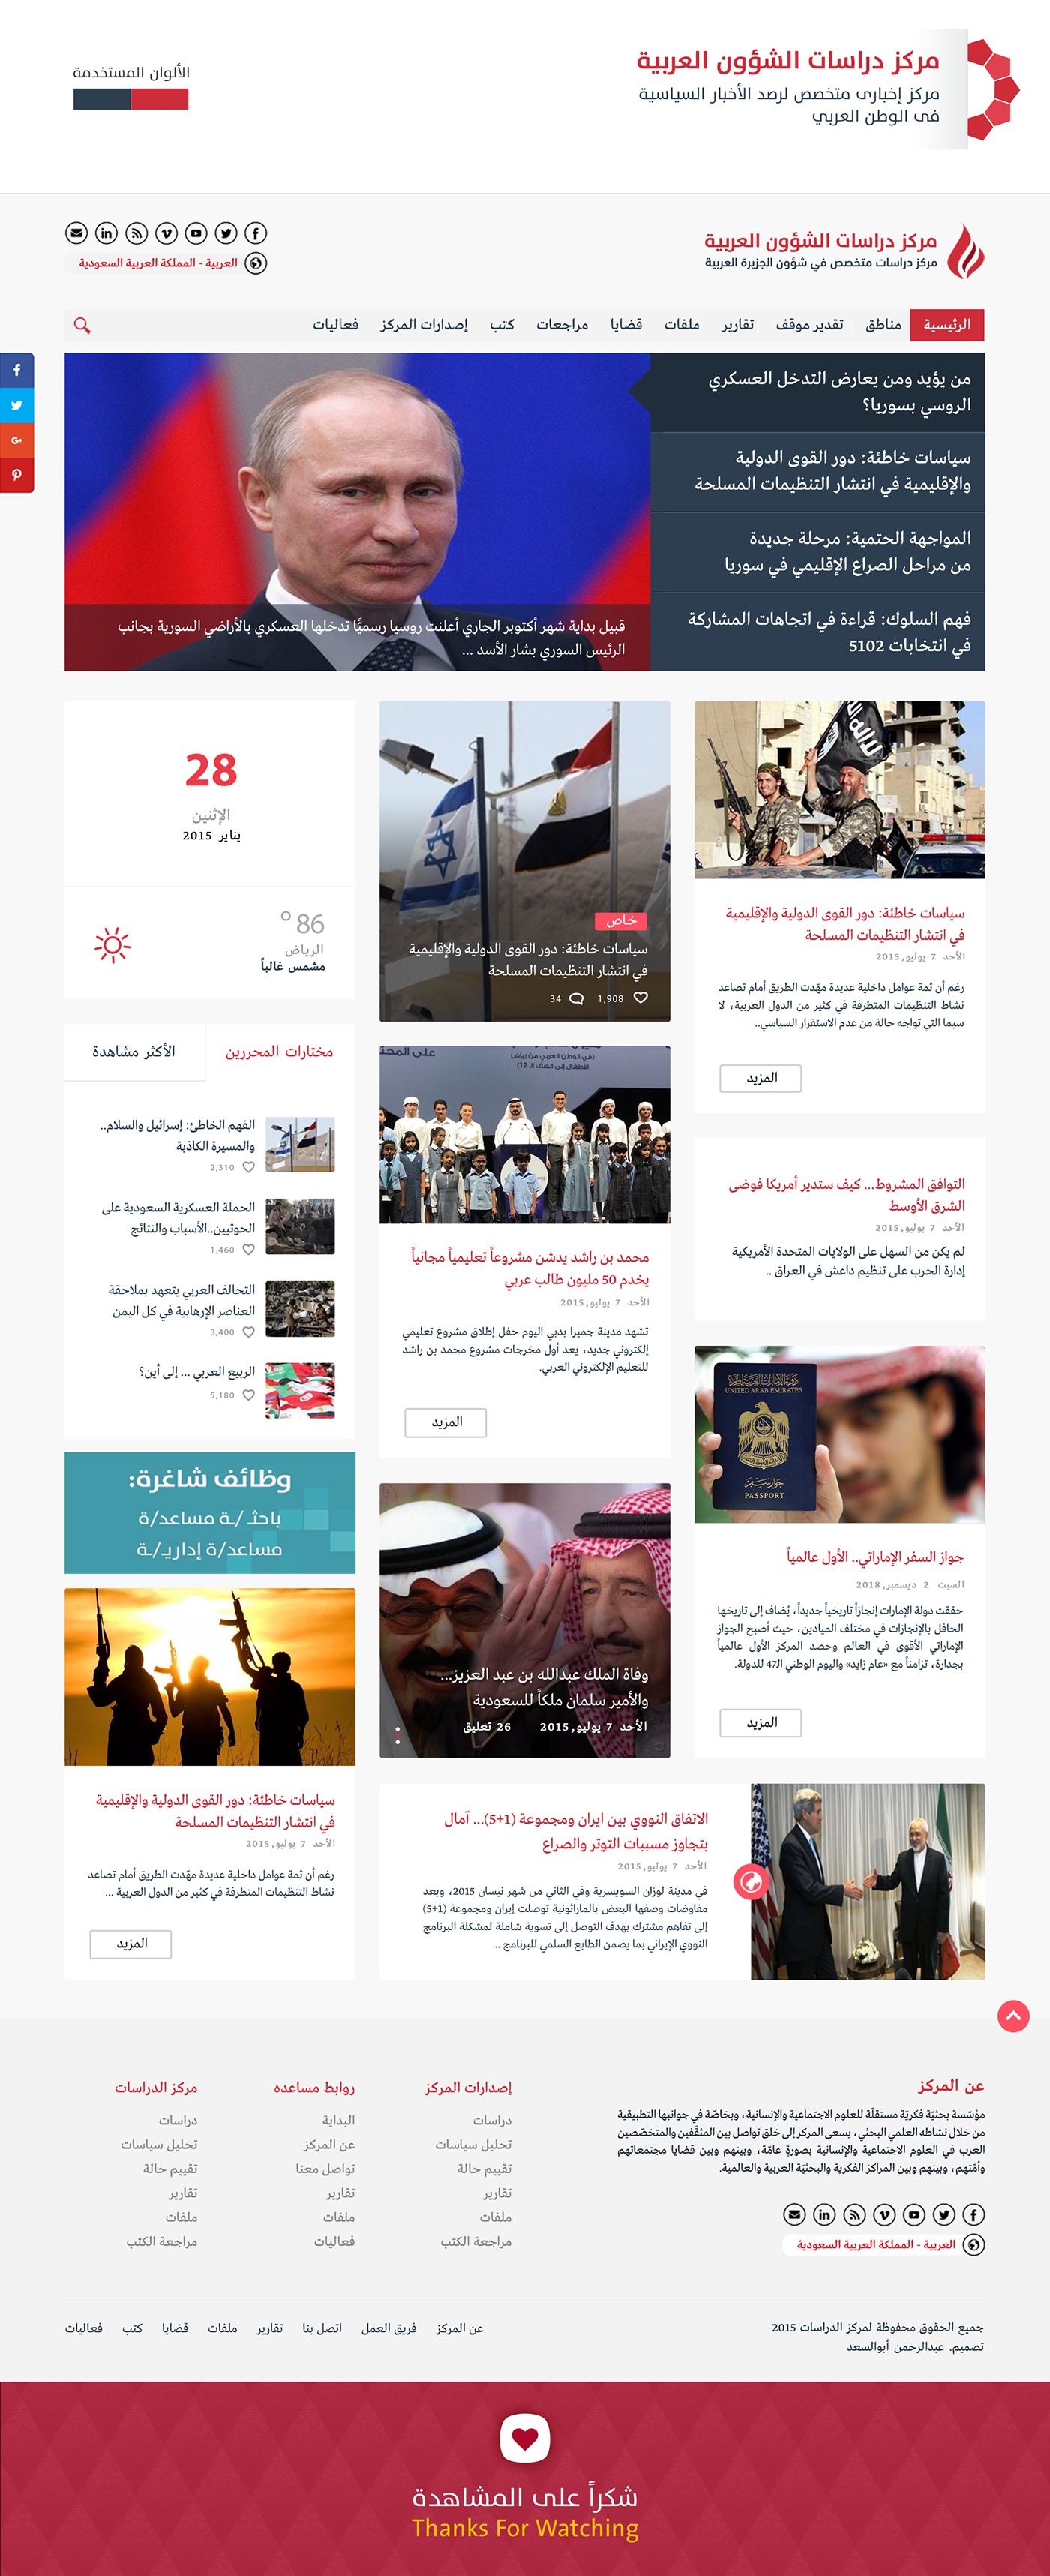 مركز الدراسات,إخبارى,أخبار ,news,design